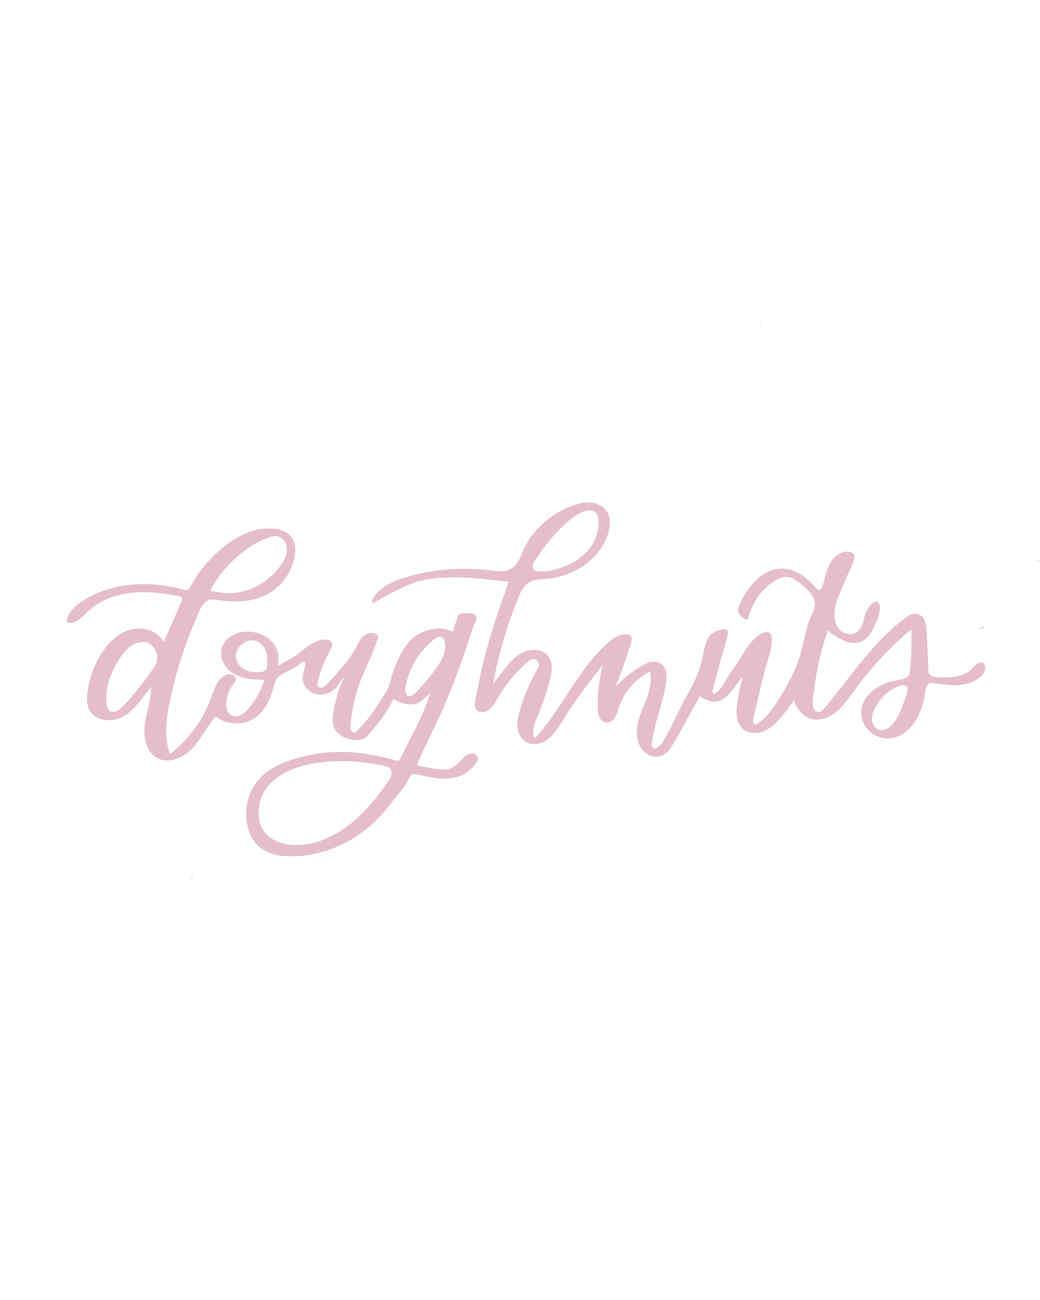 """doughnuts"" calligraphy"